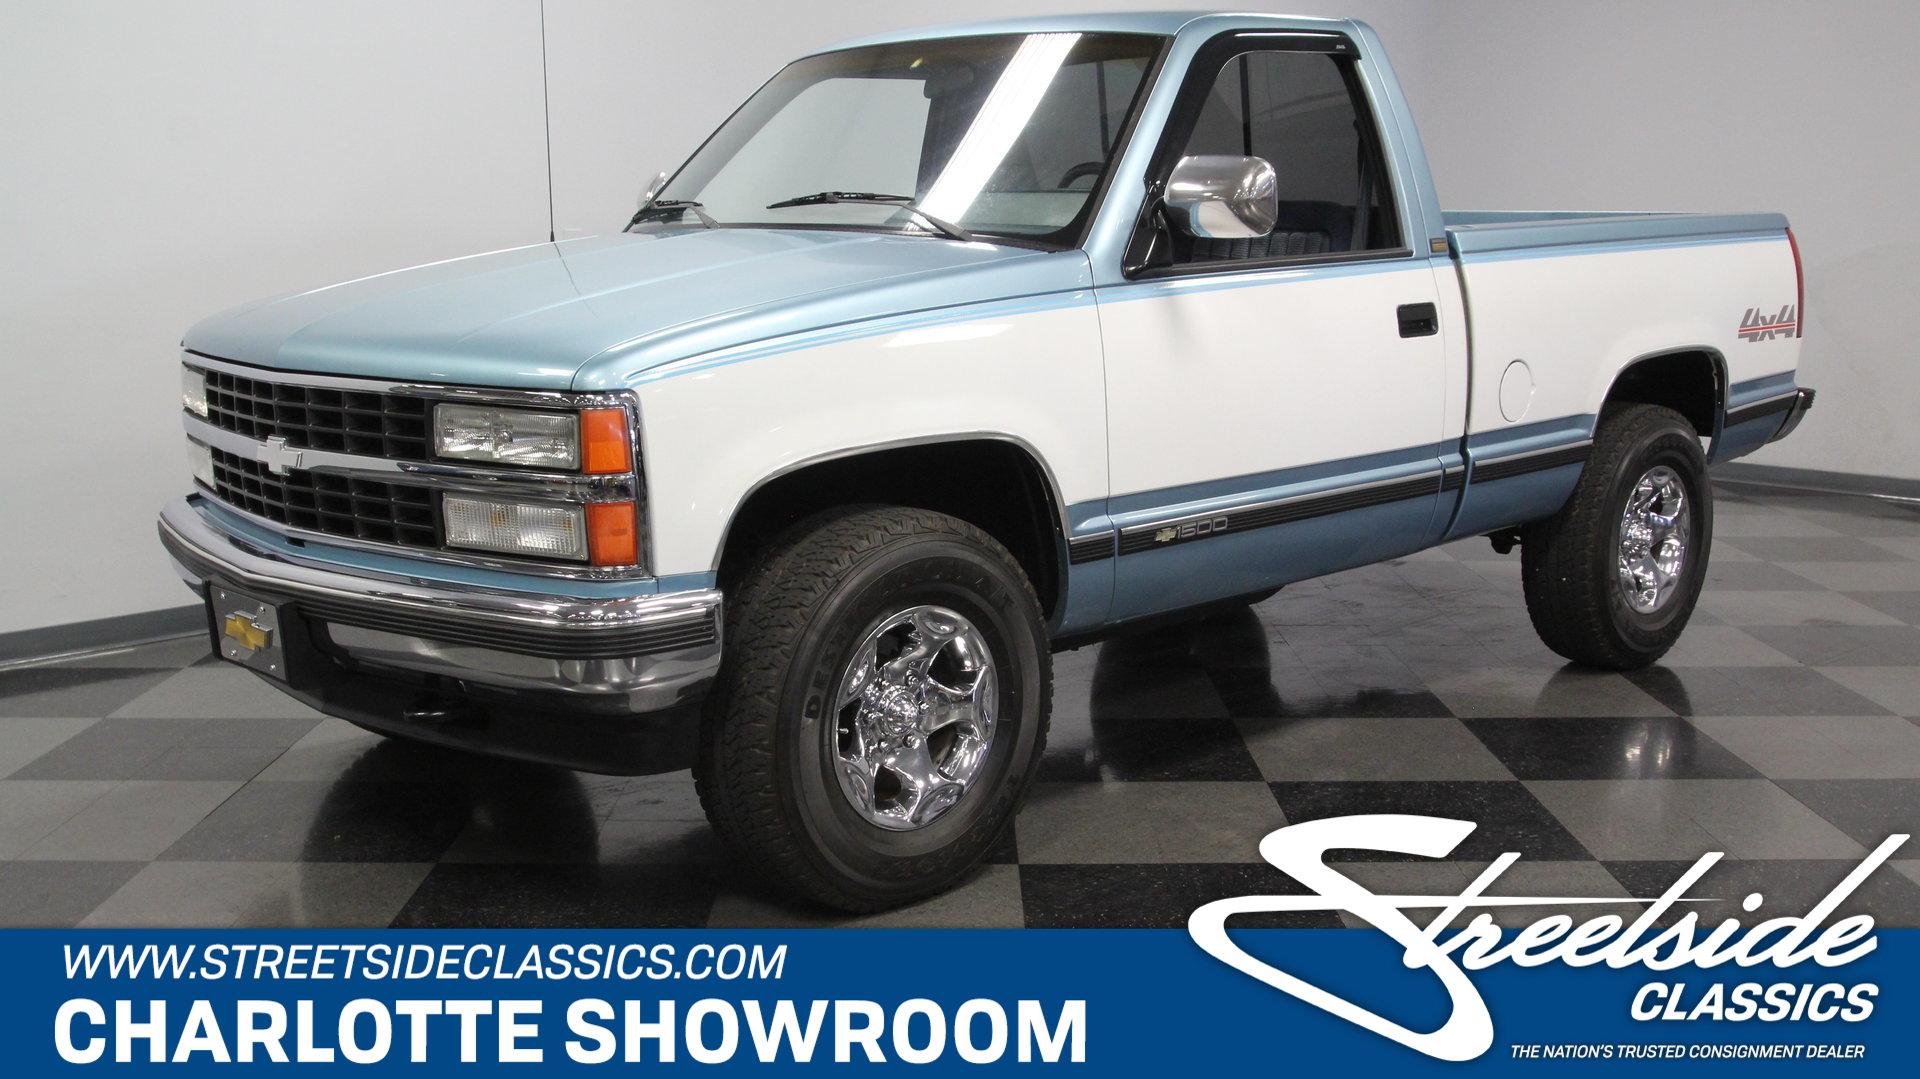 1990 Chevrolet C/K 1500 4x4 for sale #93893 | MCG